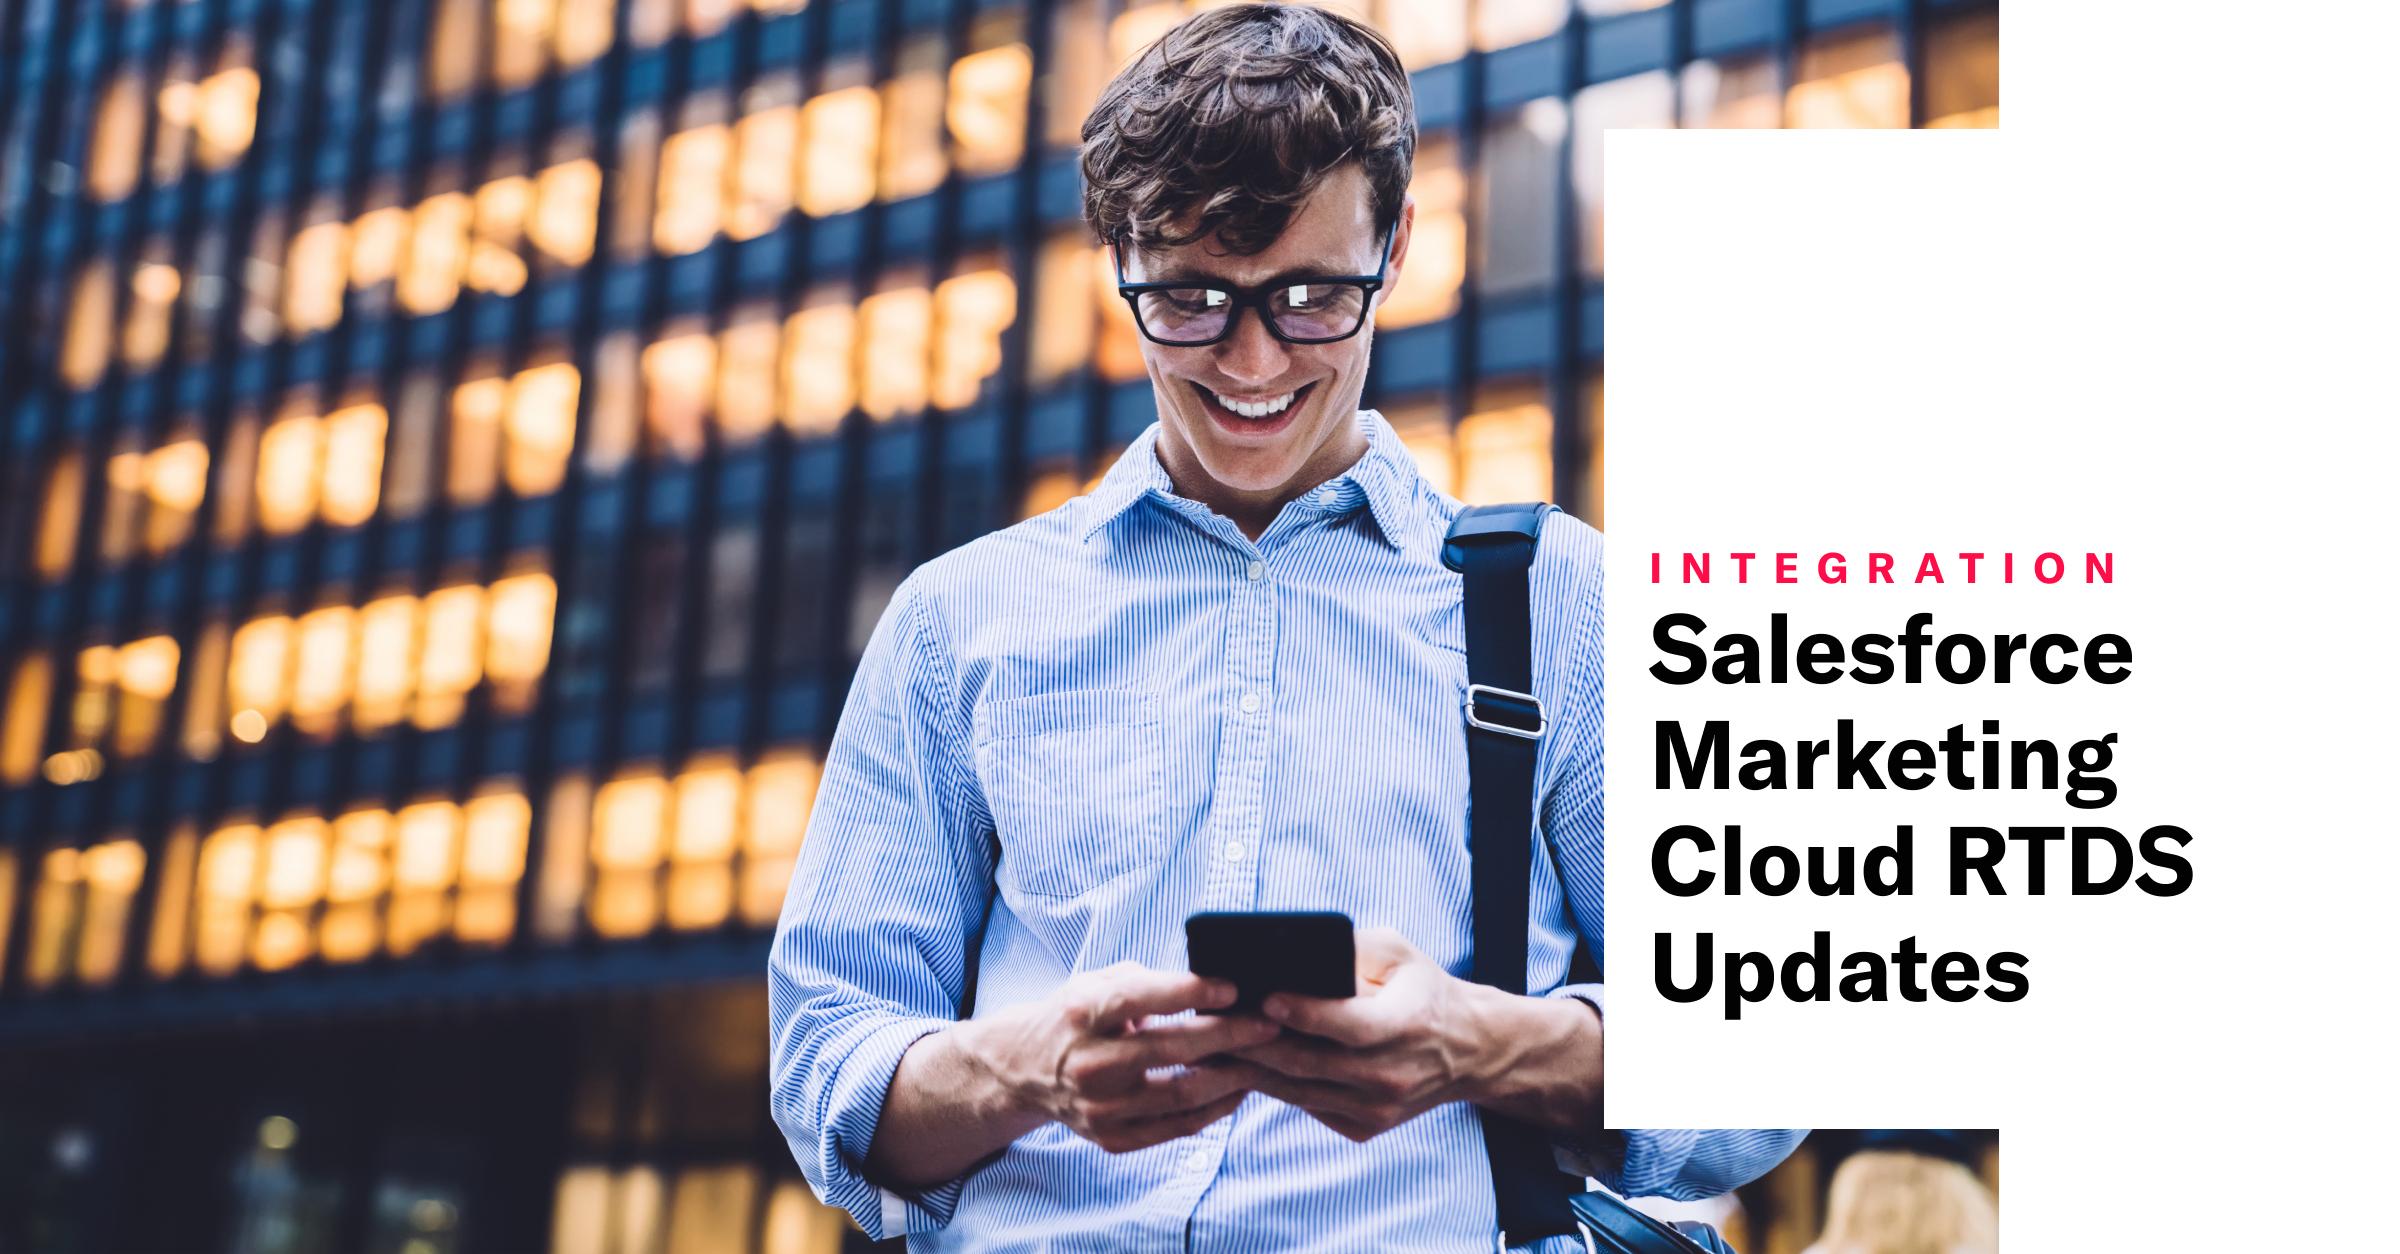 Salesforce Marketing Cloud RTDS Updates